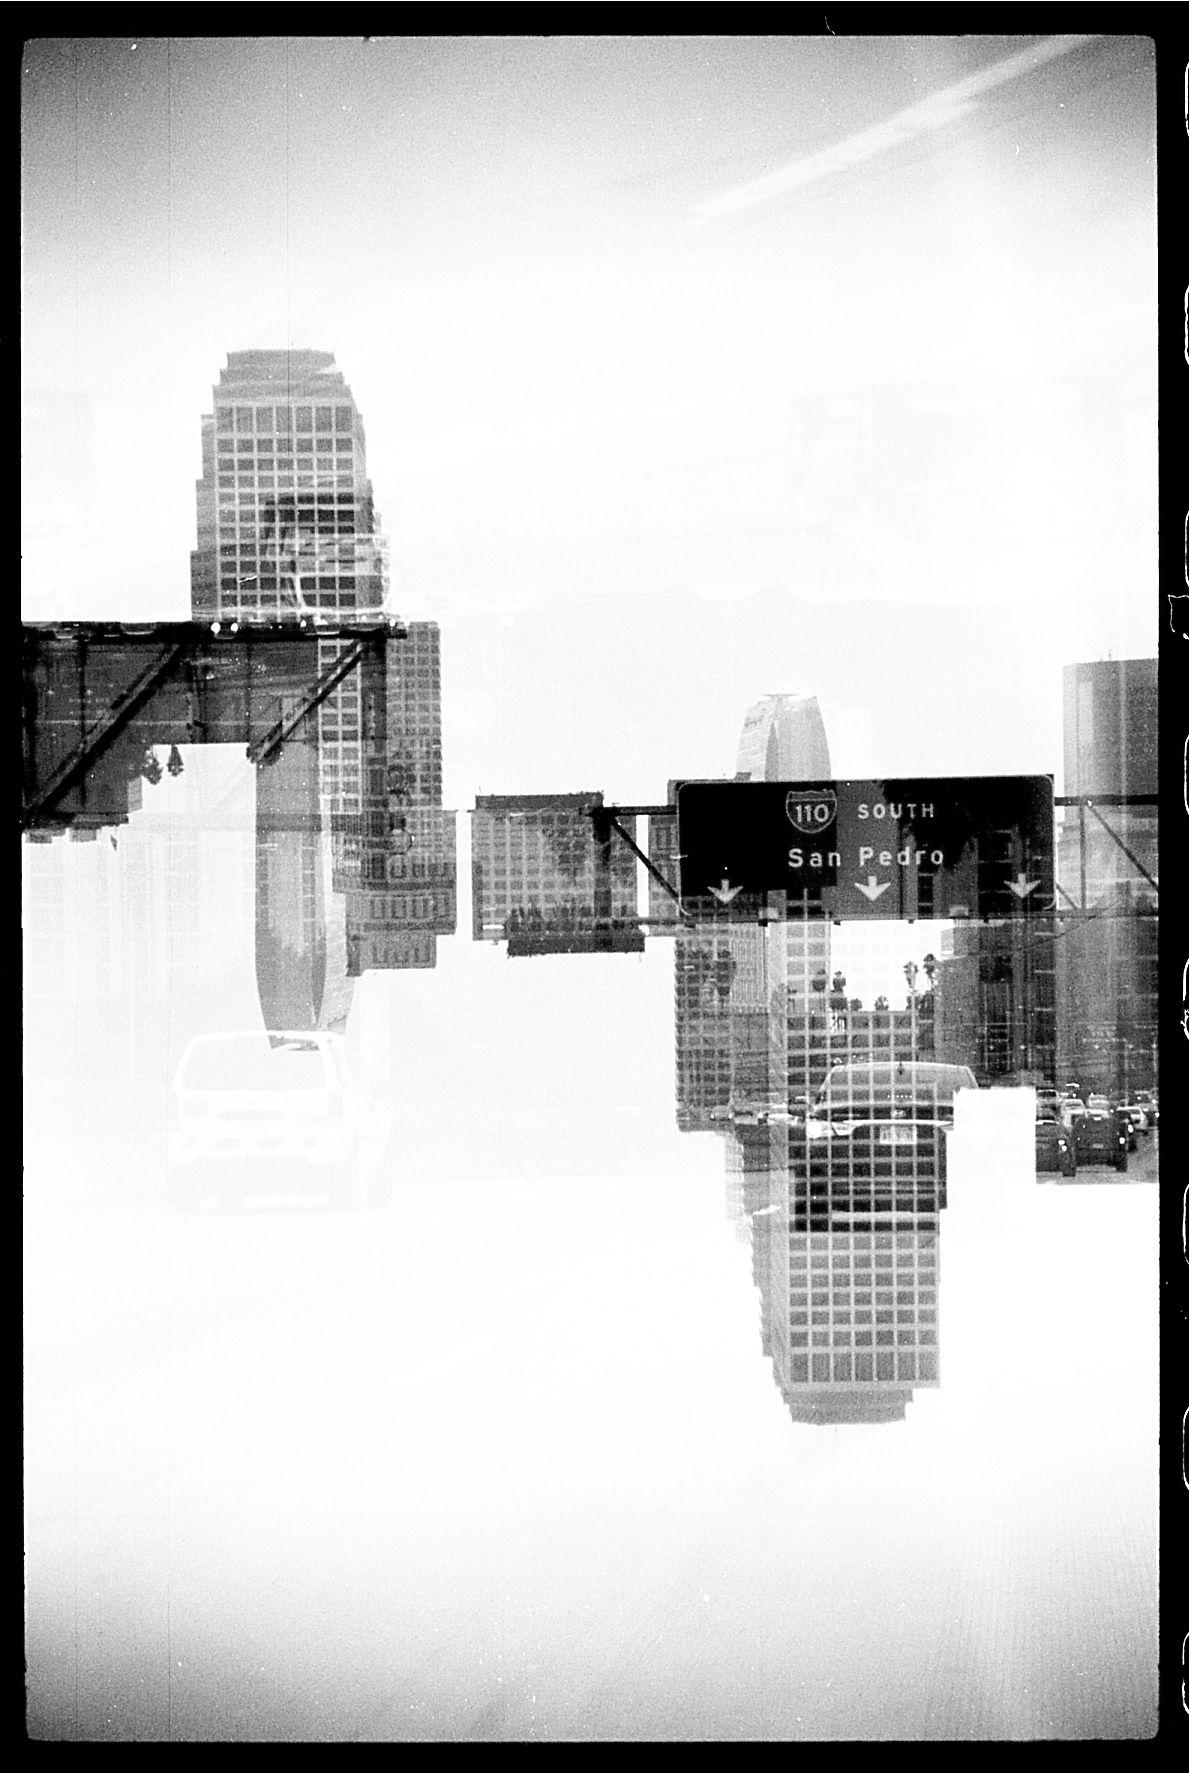 Richard G. Auxilio | Design | Pinterest | Double exposure ...